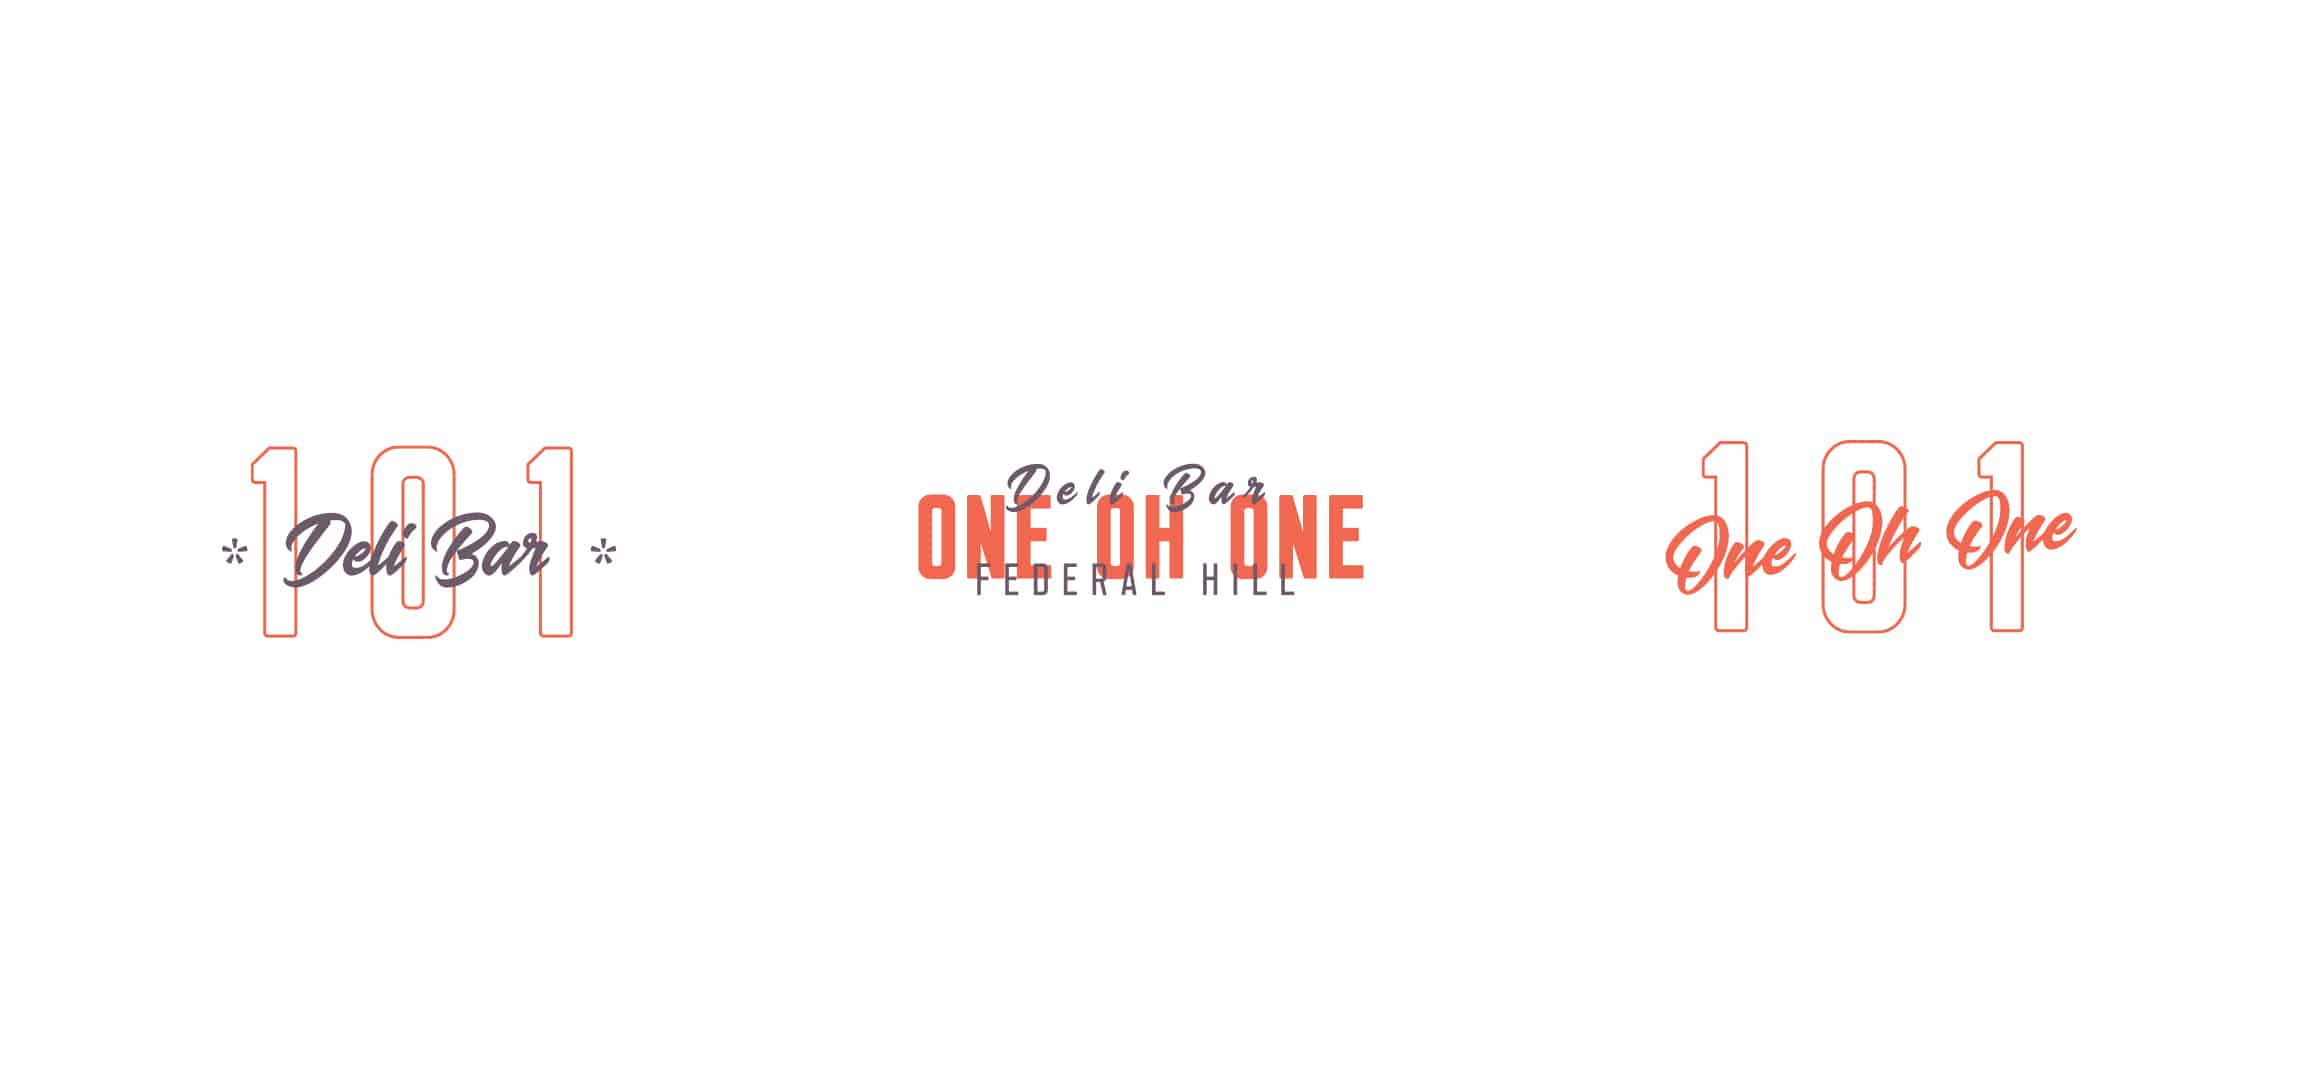 101 Delibar restaurant concept development and branding secondary logo marks and designs